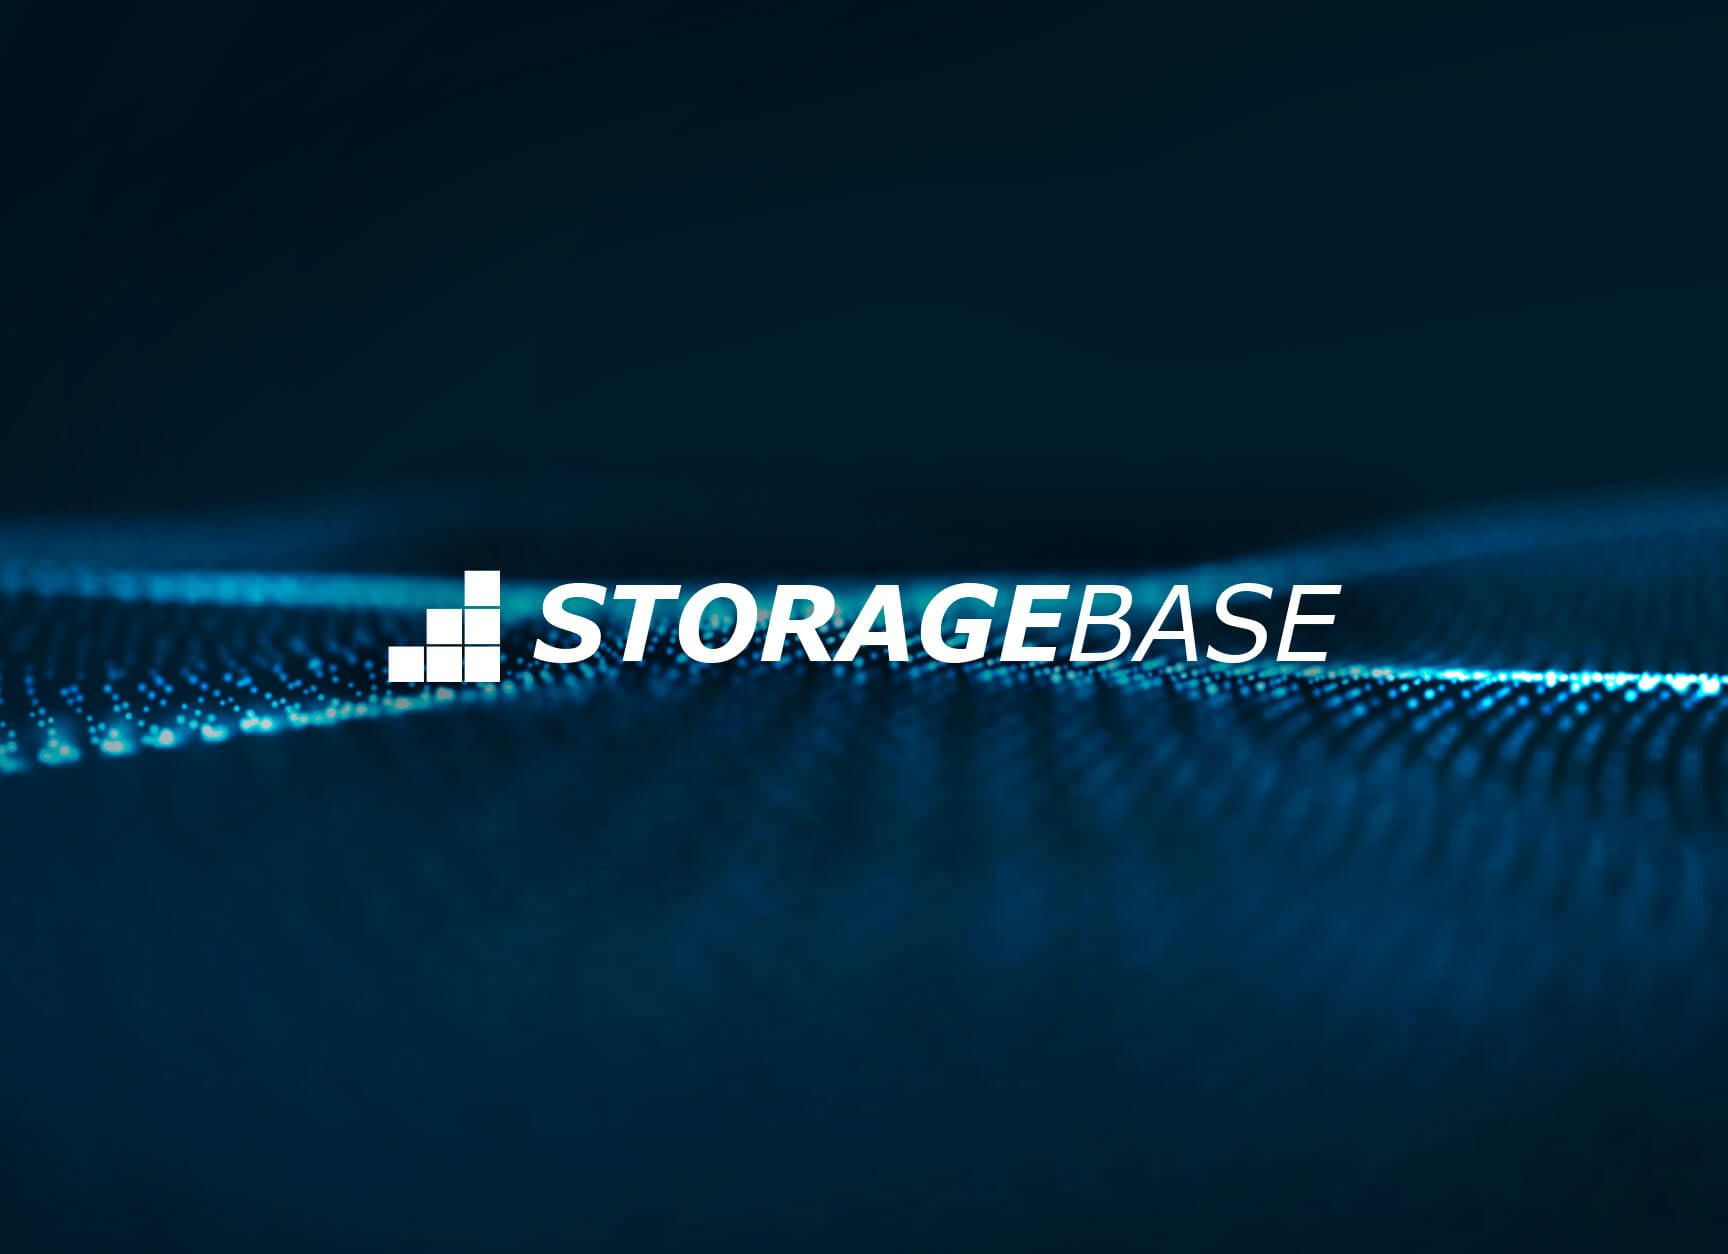 diva-e Data-Experten erzielen 30 % Umsatzsteigerung bei StorageBase